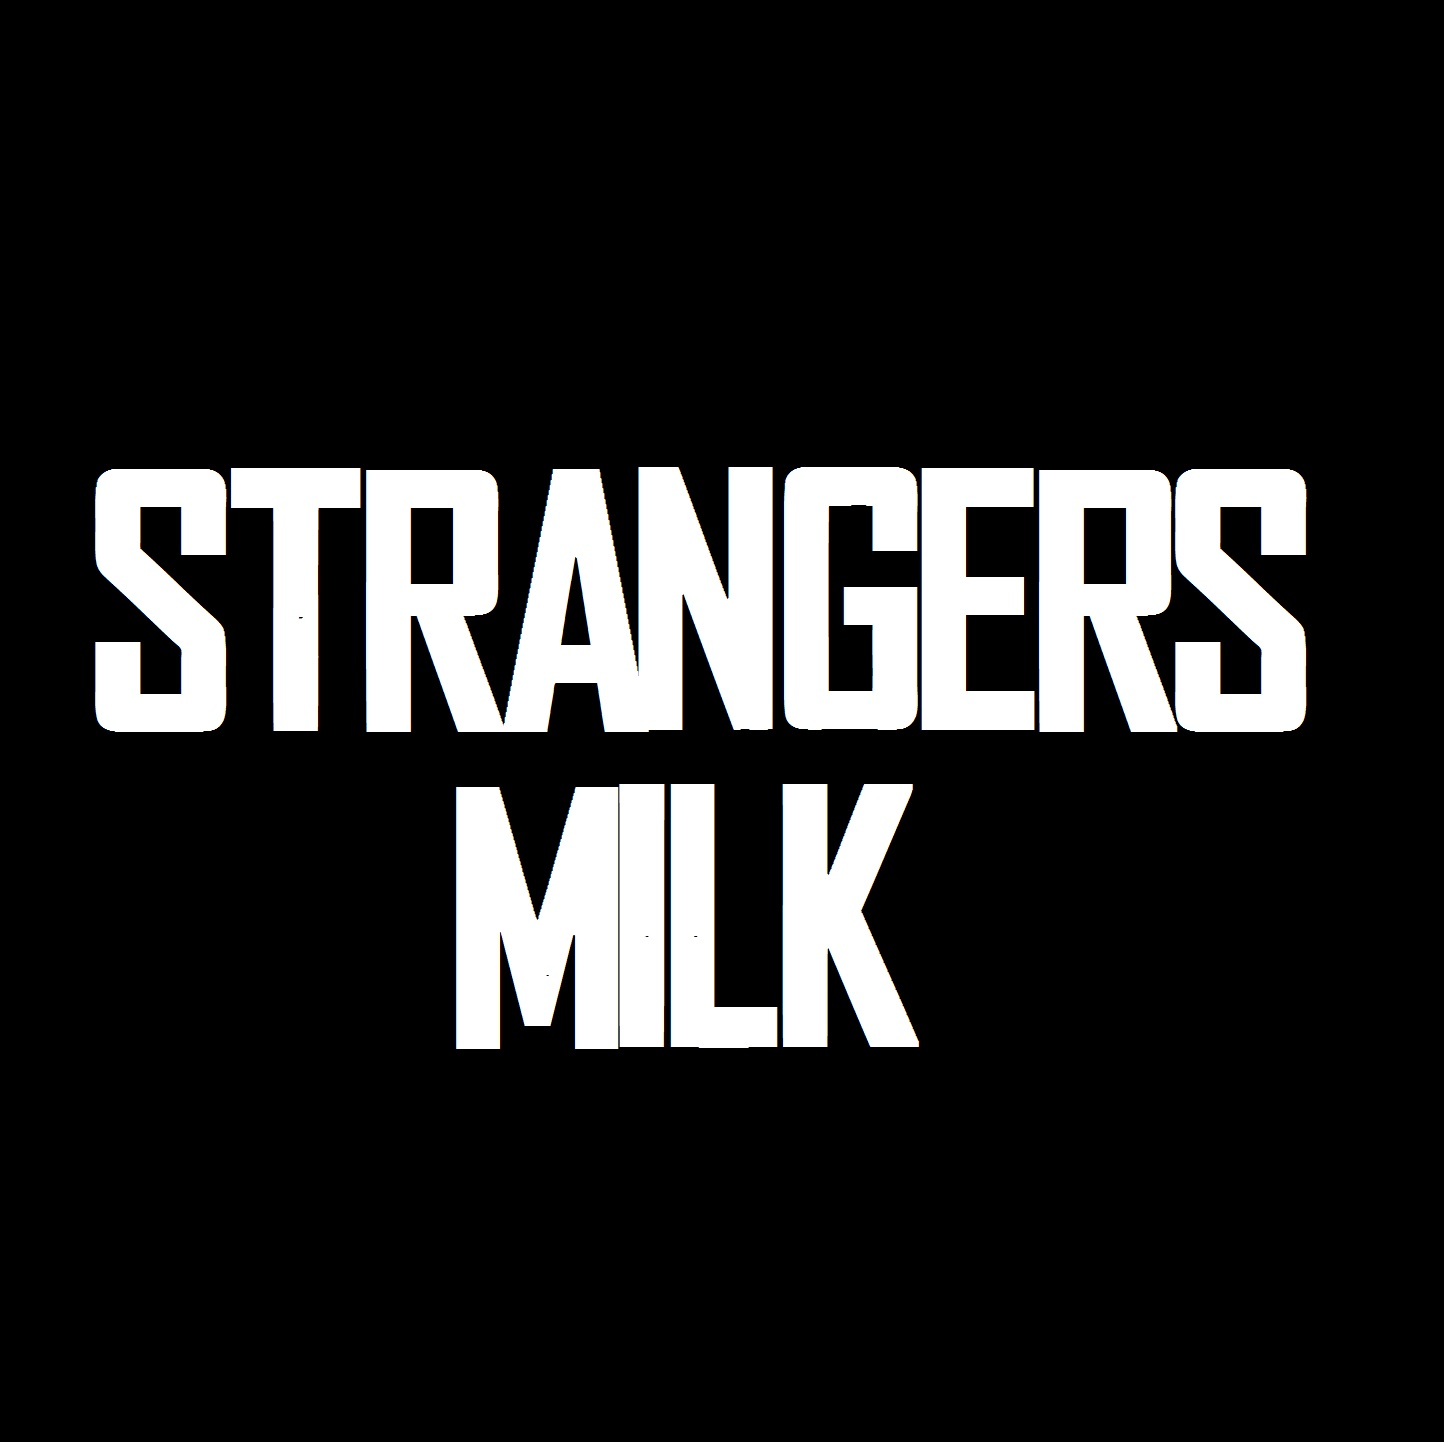 Strangers Milk